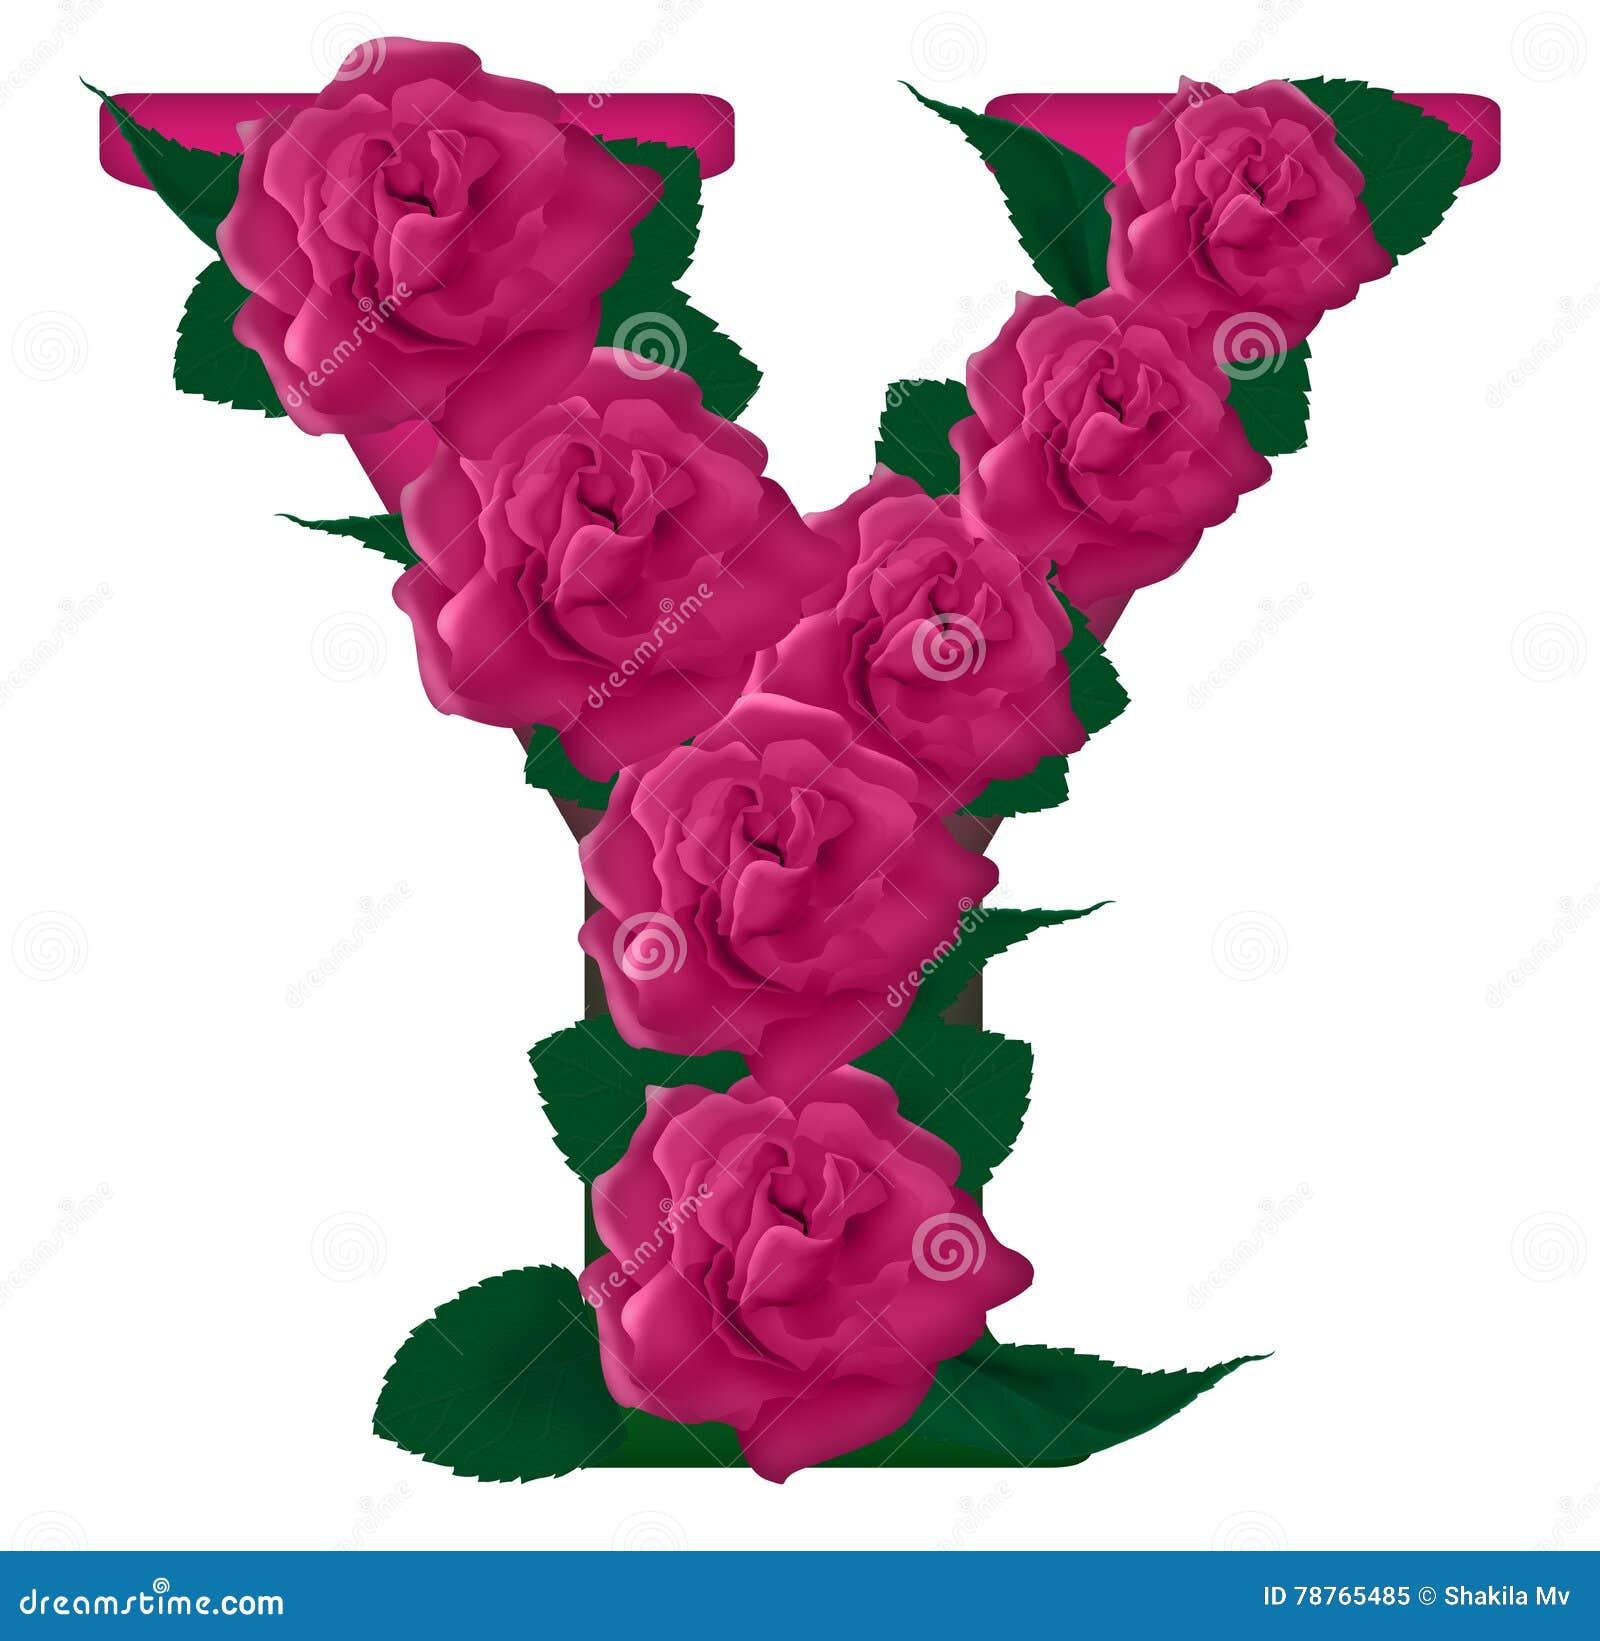 Letter y cute flower illustration stock image illustration of letter y cute flower illustration mightylinksfo